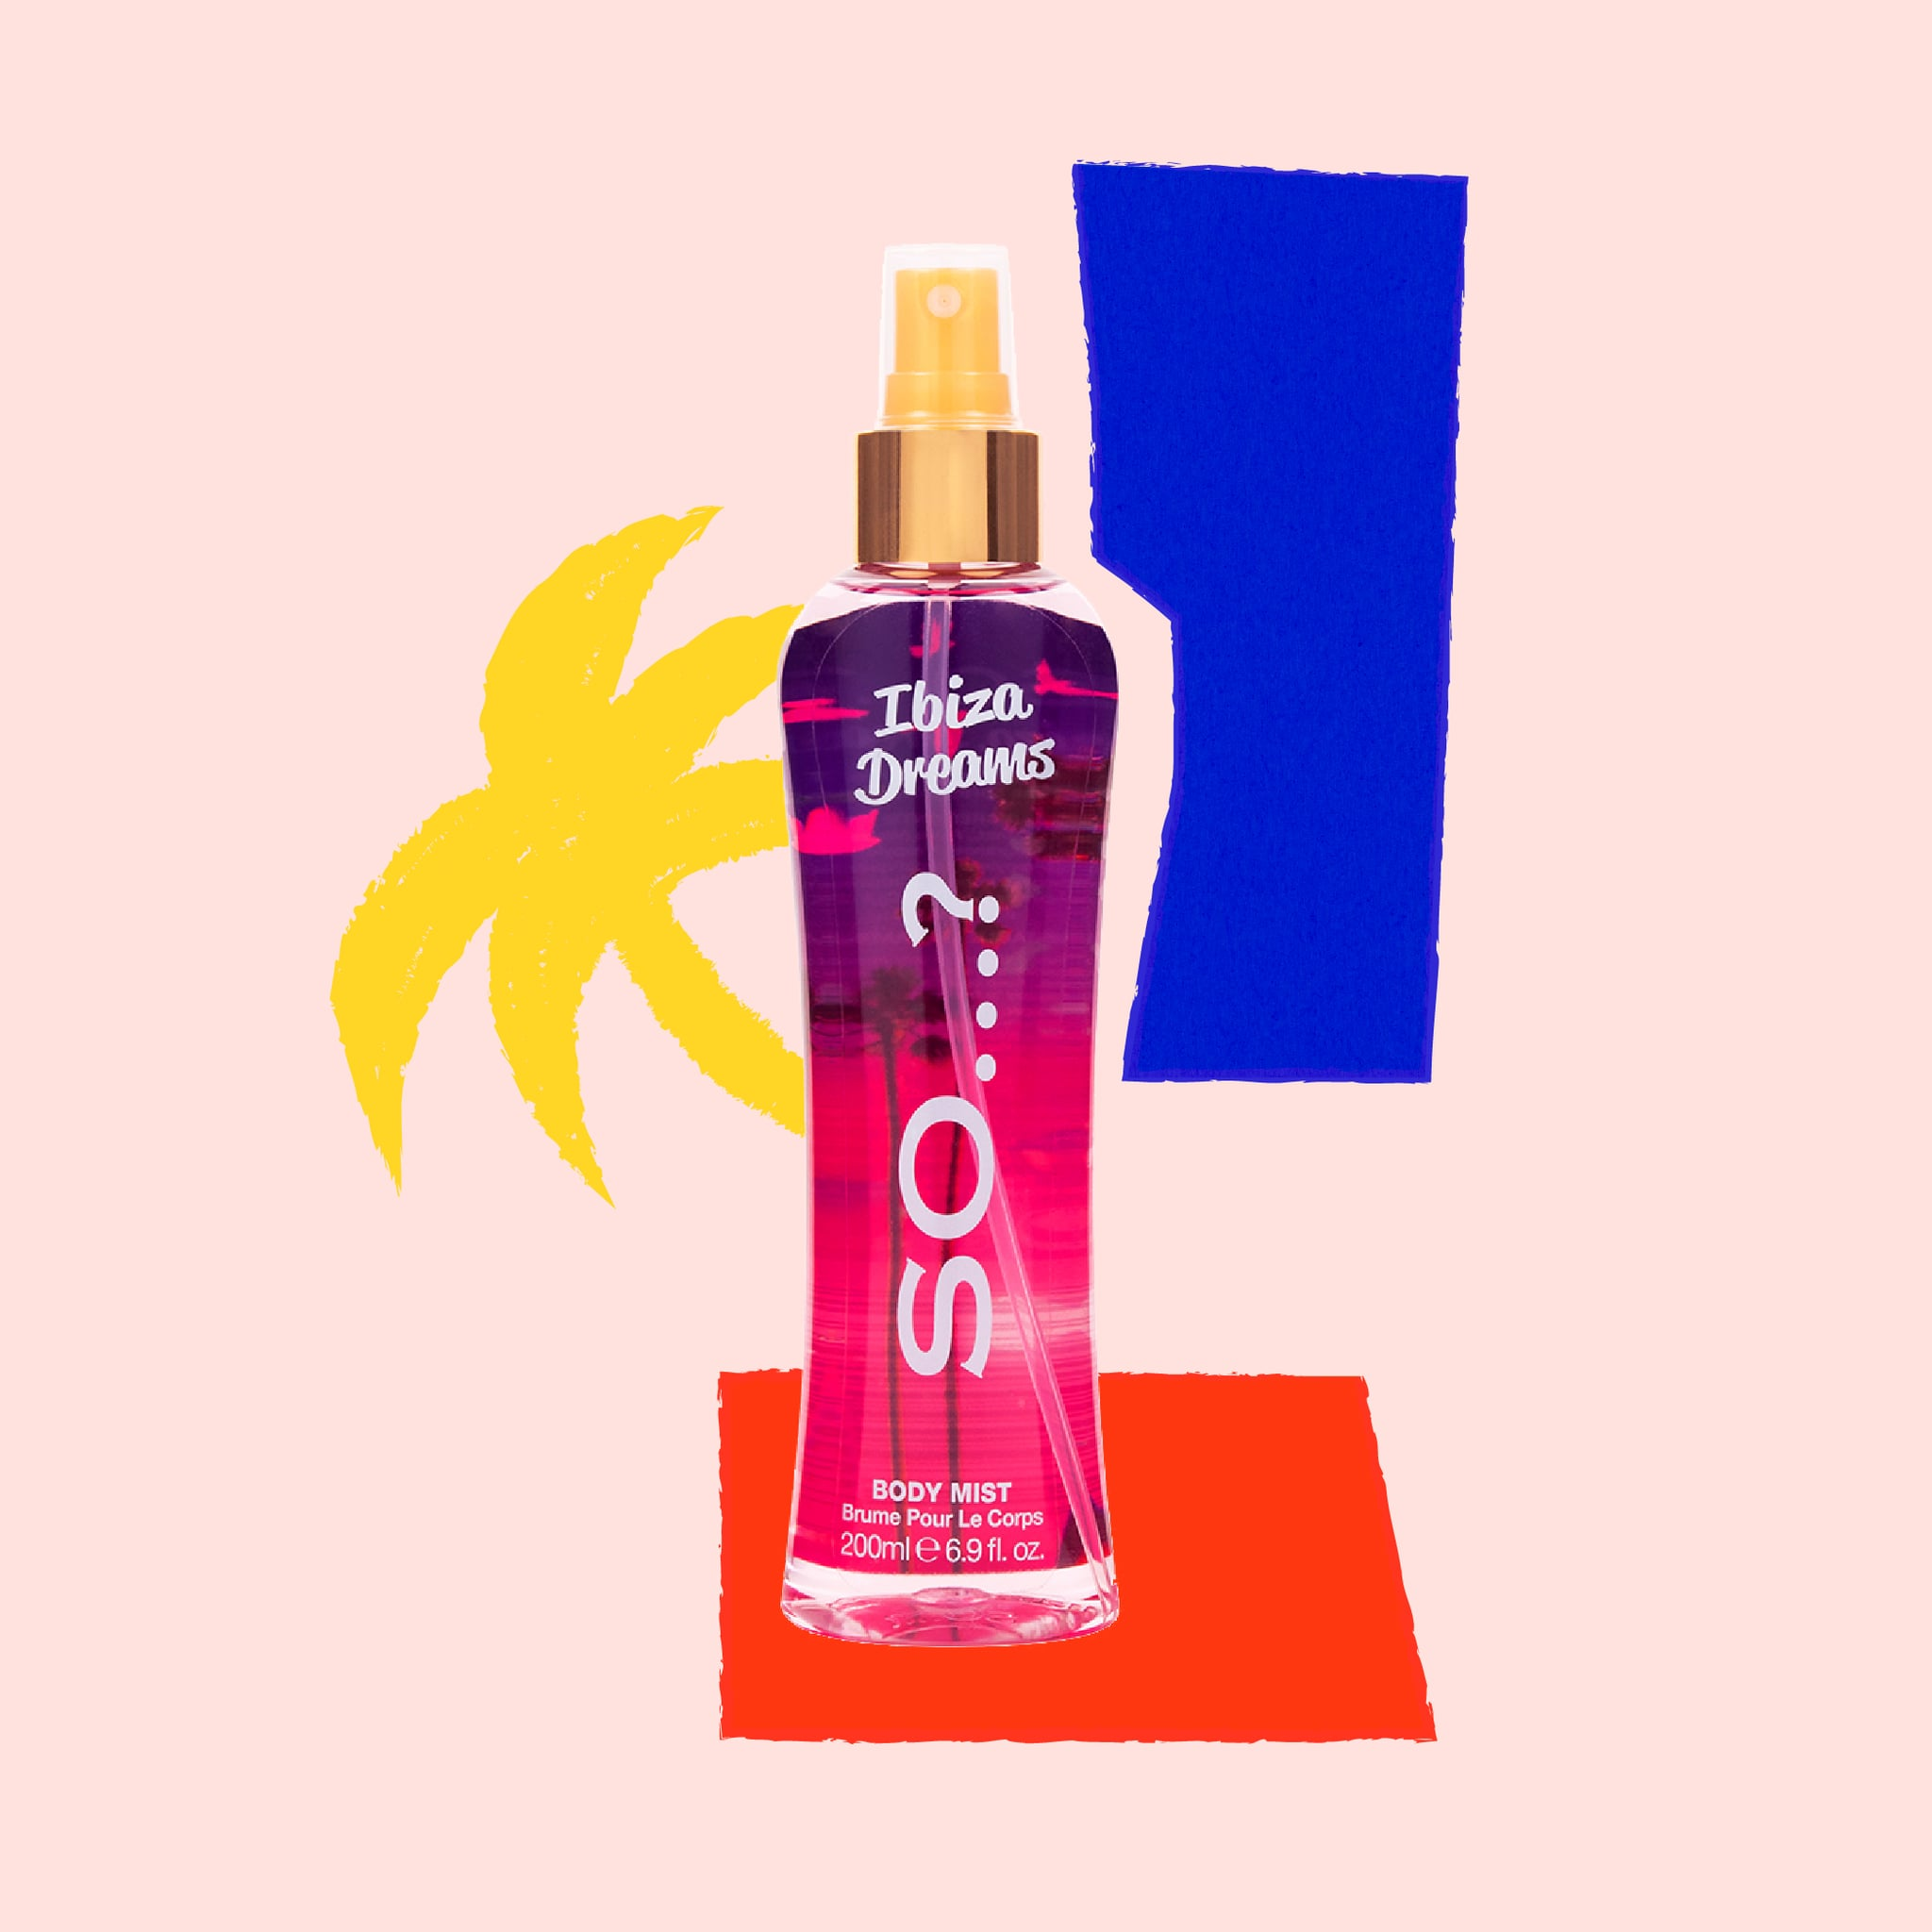 So…? Ibiza Dreams Body Mist